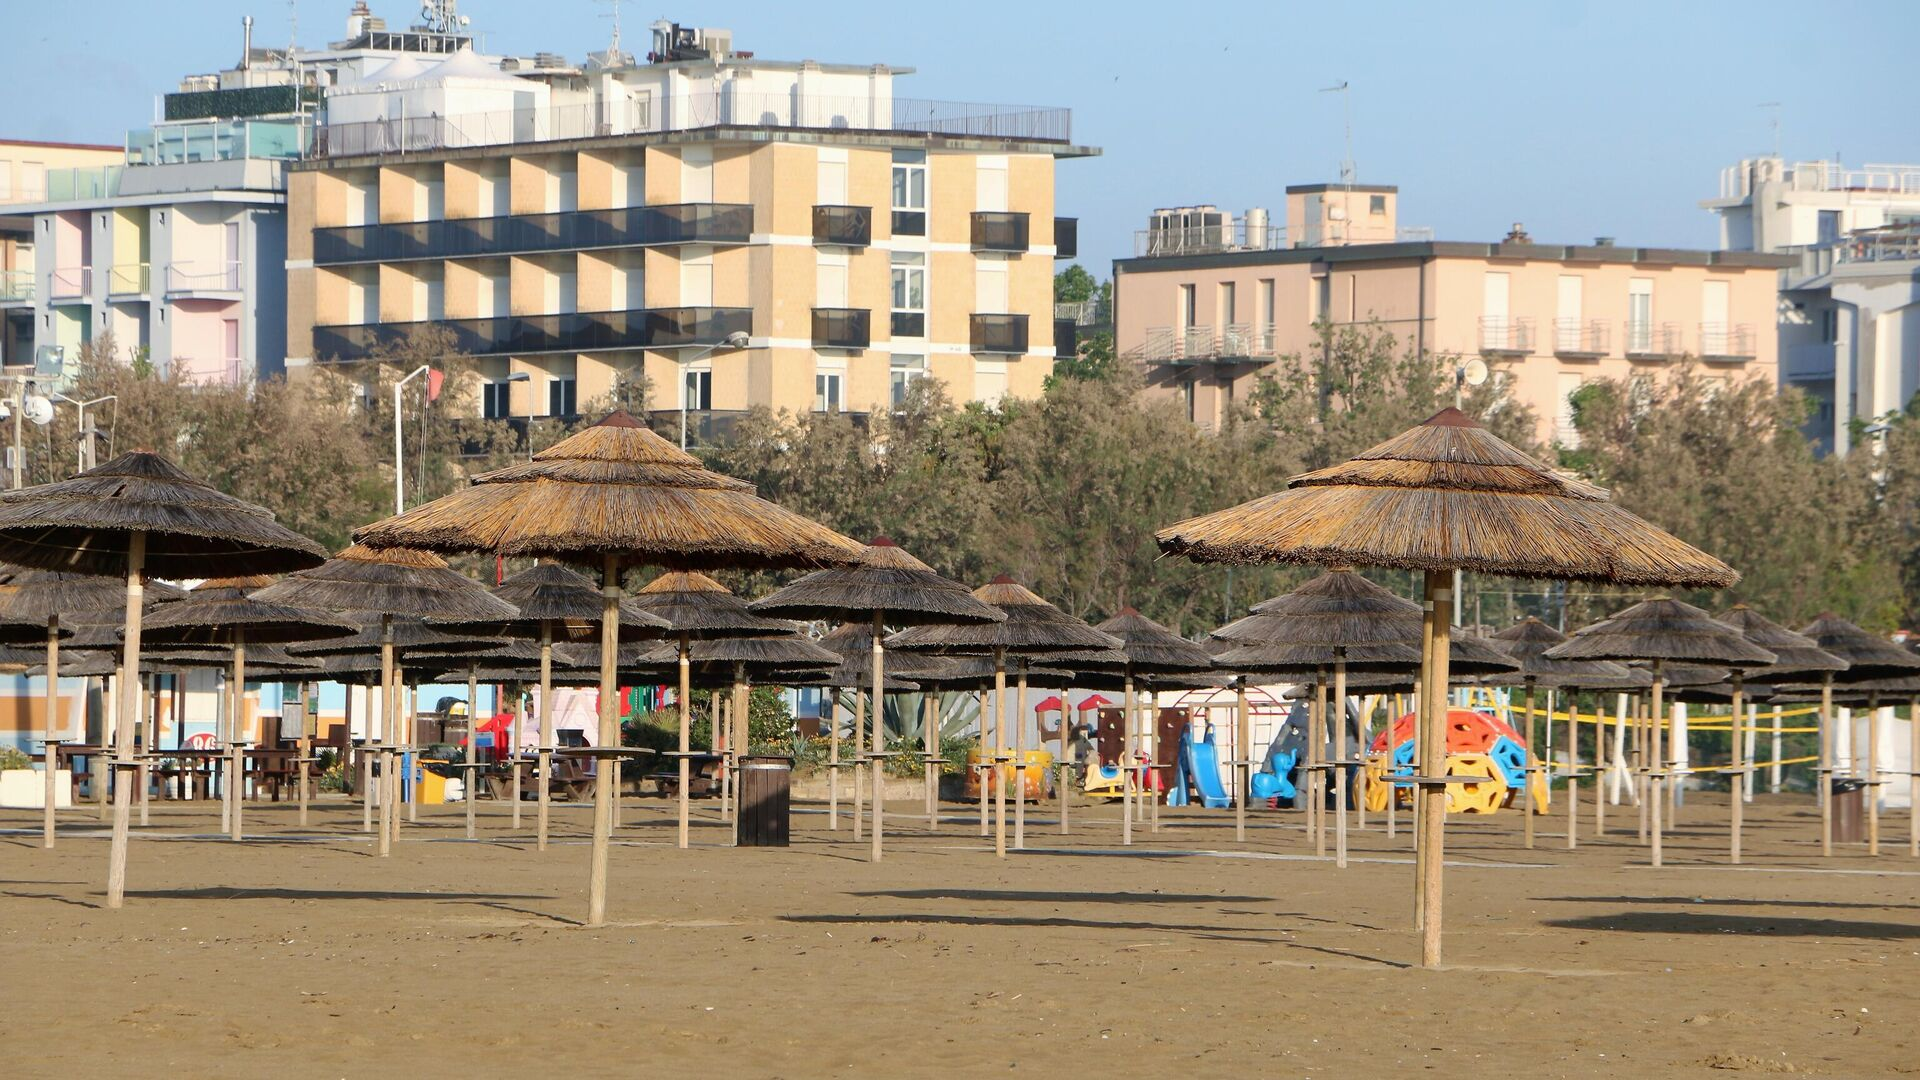 Spiaggia vuota a Rimini - Sputnik Italia, 1920, 26.06.2021